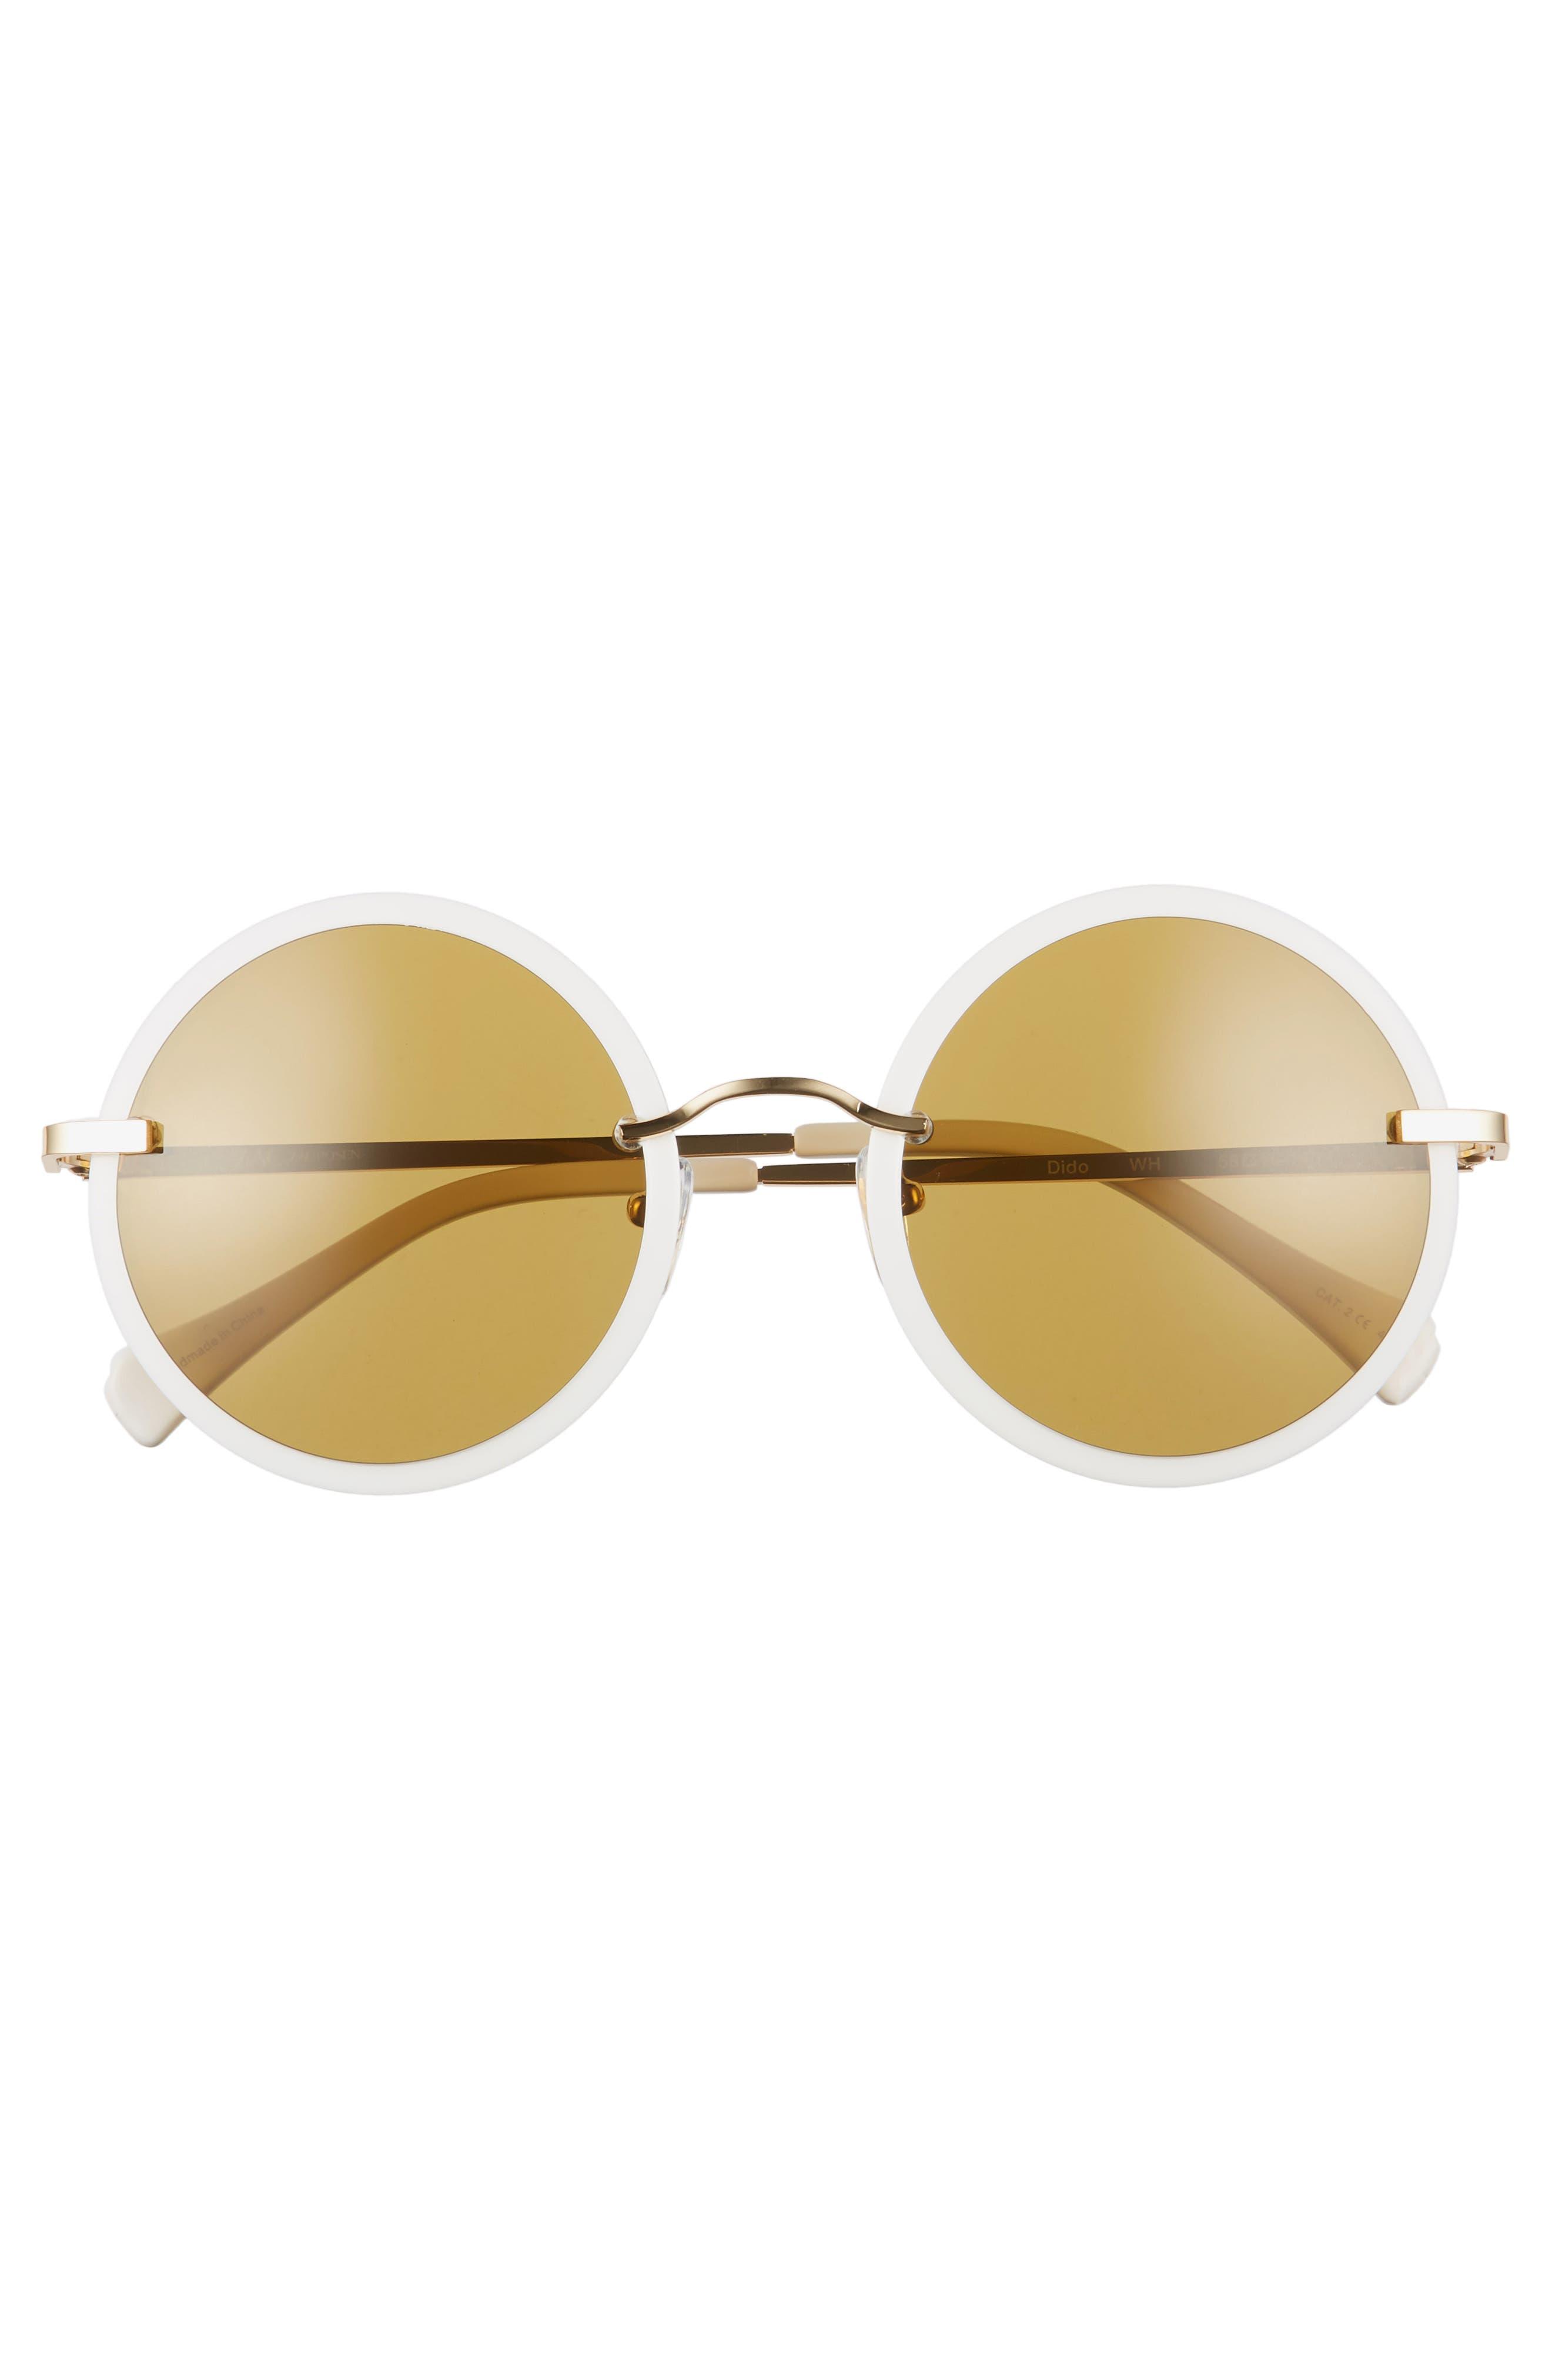 Dido 58mm Sunglasses,                             Alternate thumbnail 3, color,                             White/ Gold